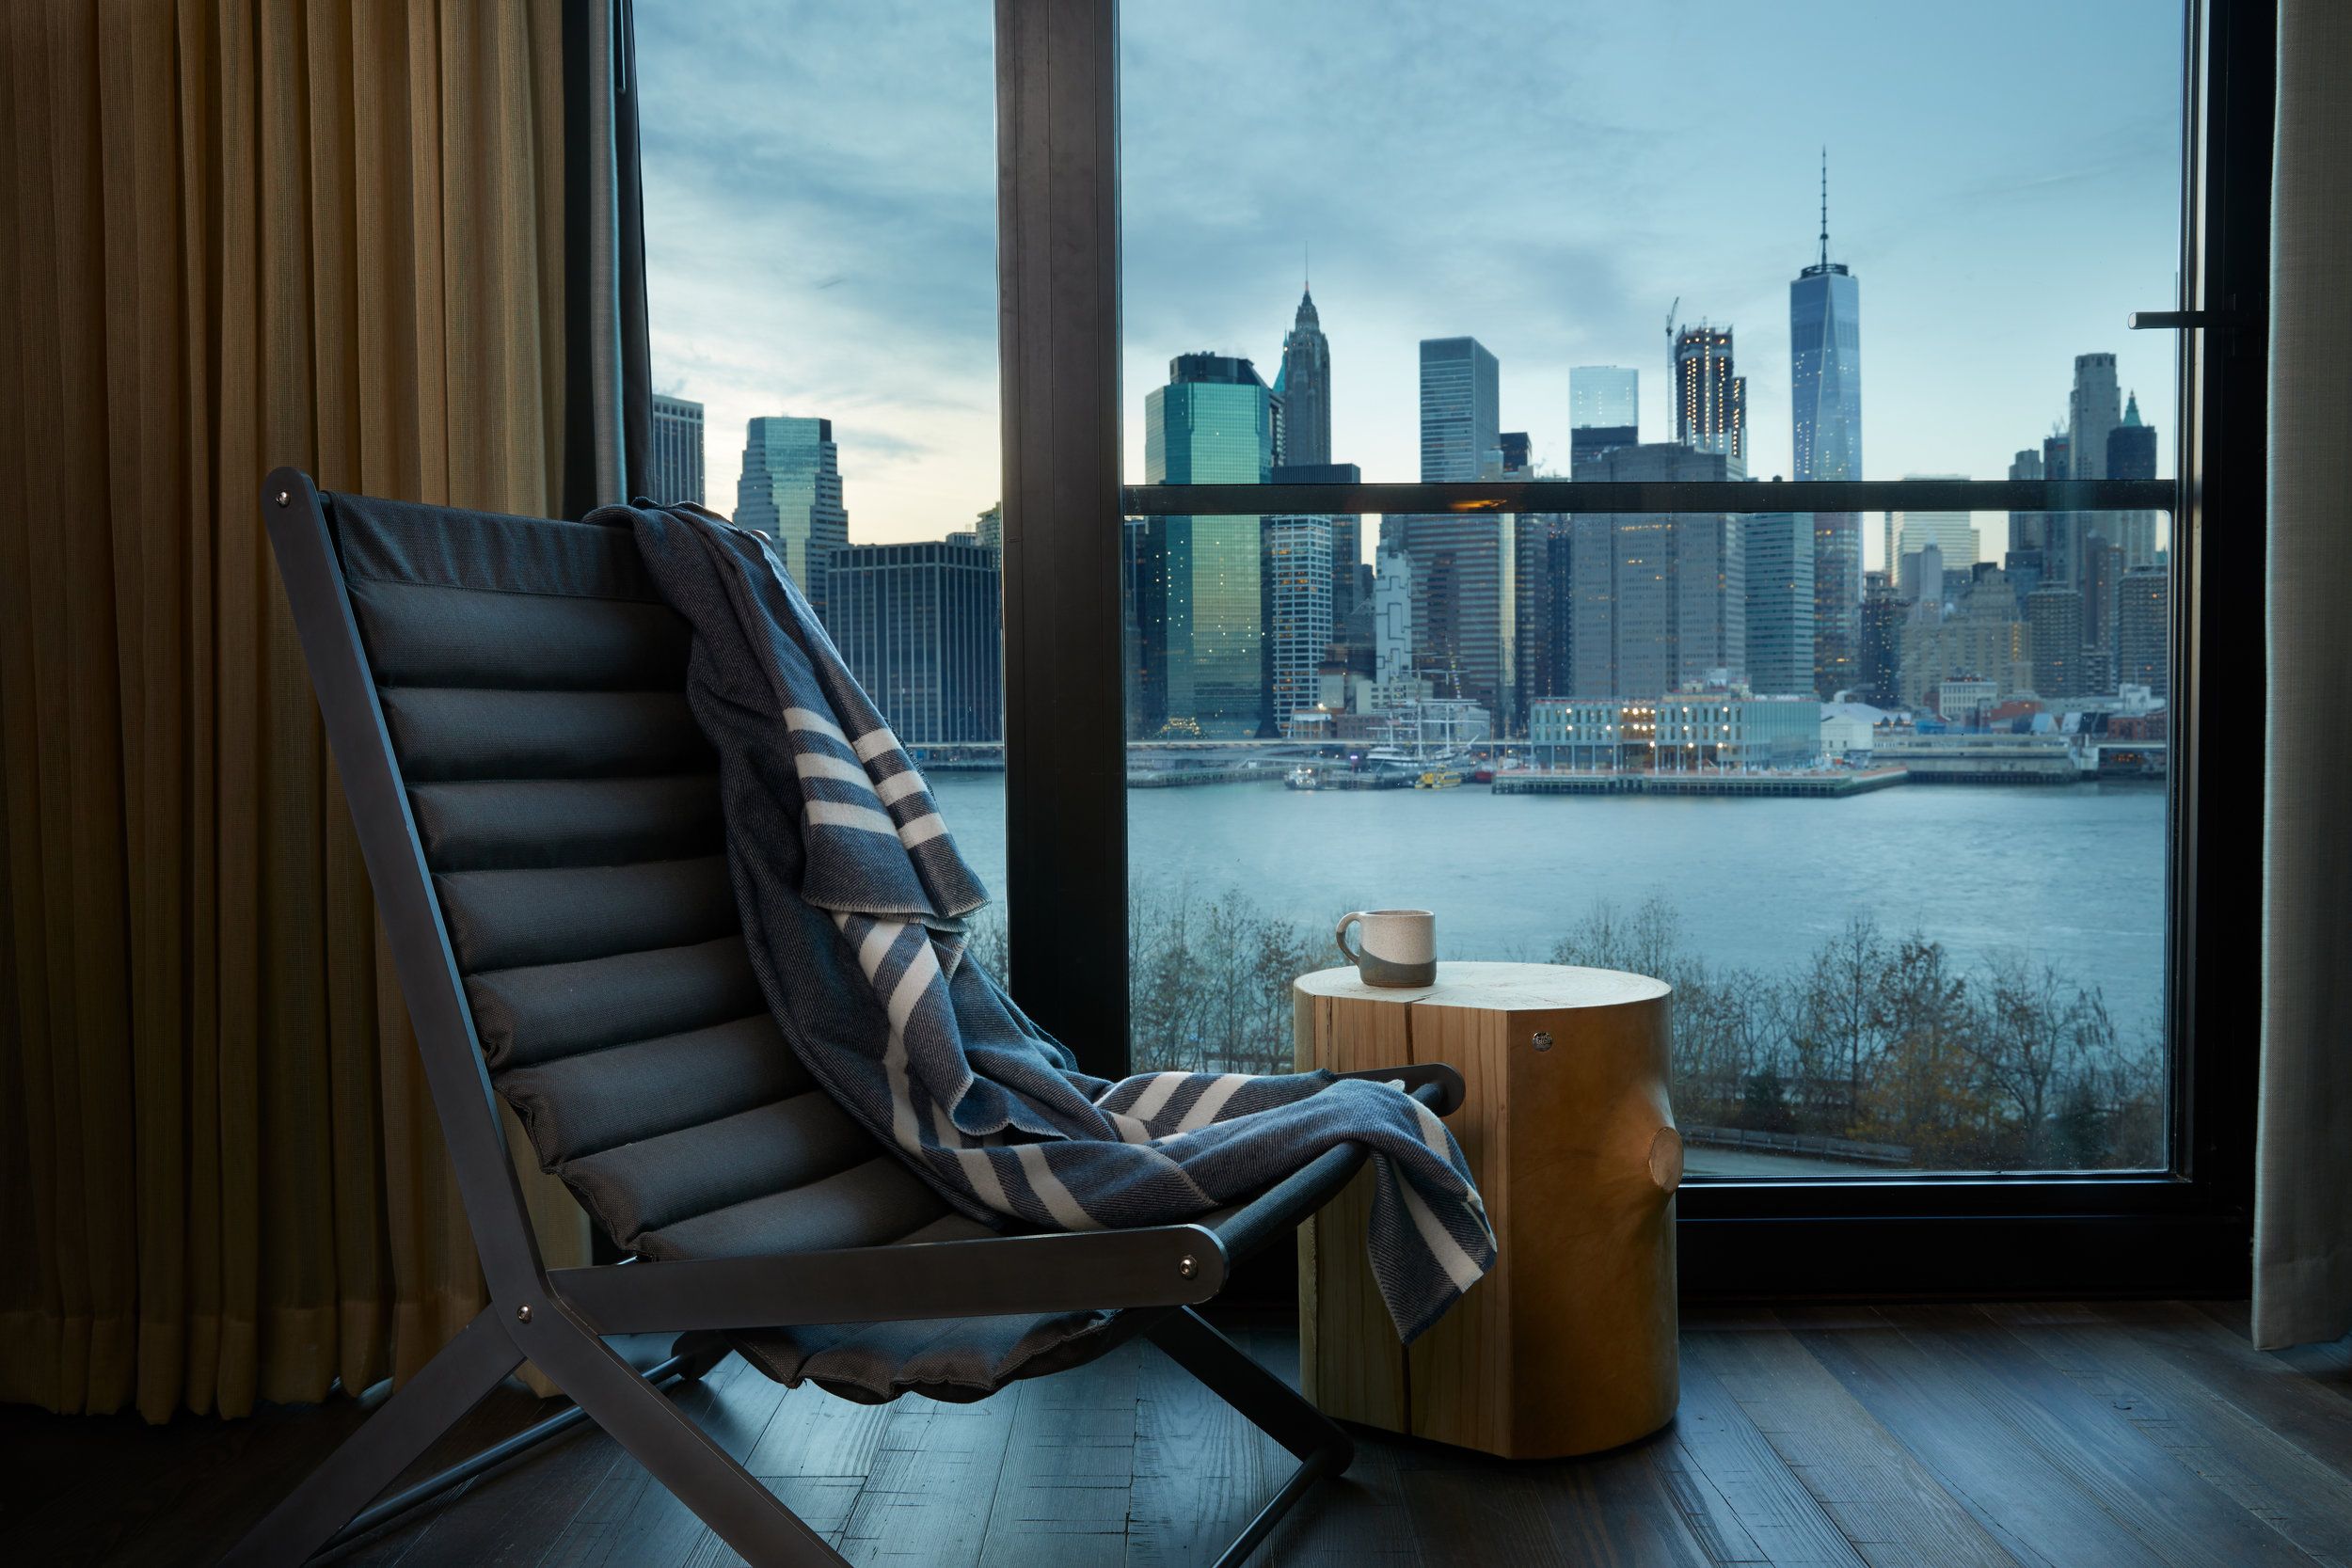 1_Hotel_Brooklyn_Bridge_King_Seating_Detail_HI.jpg